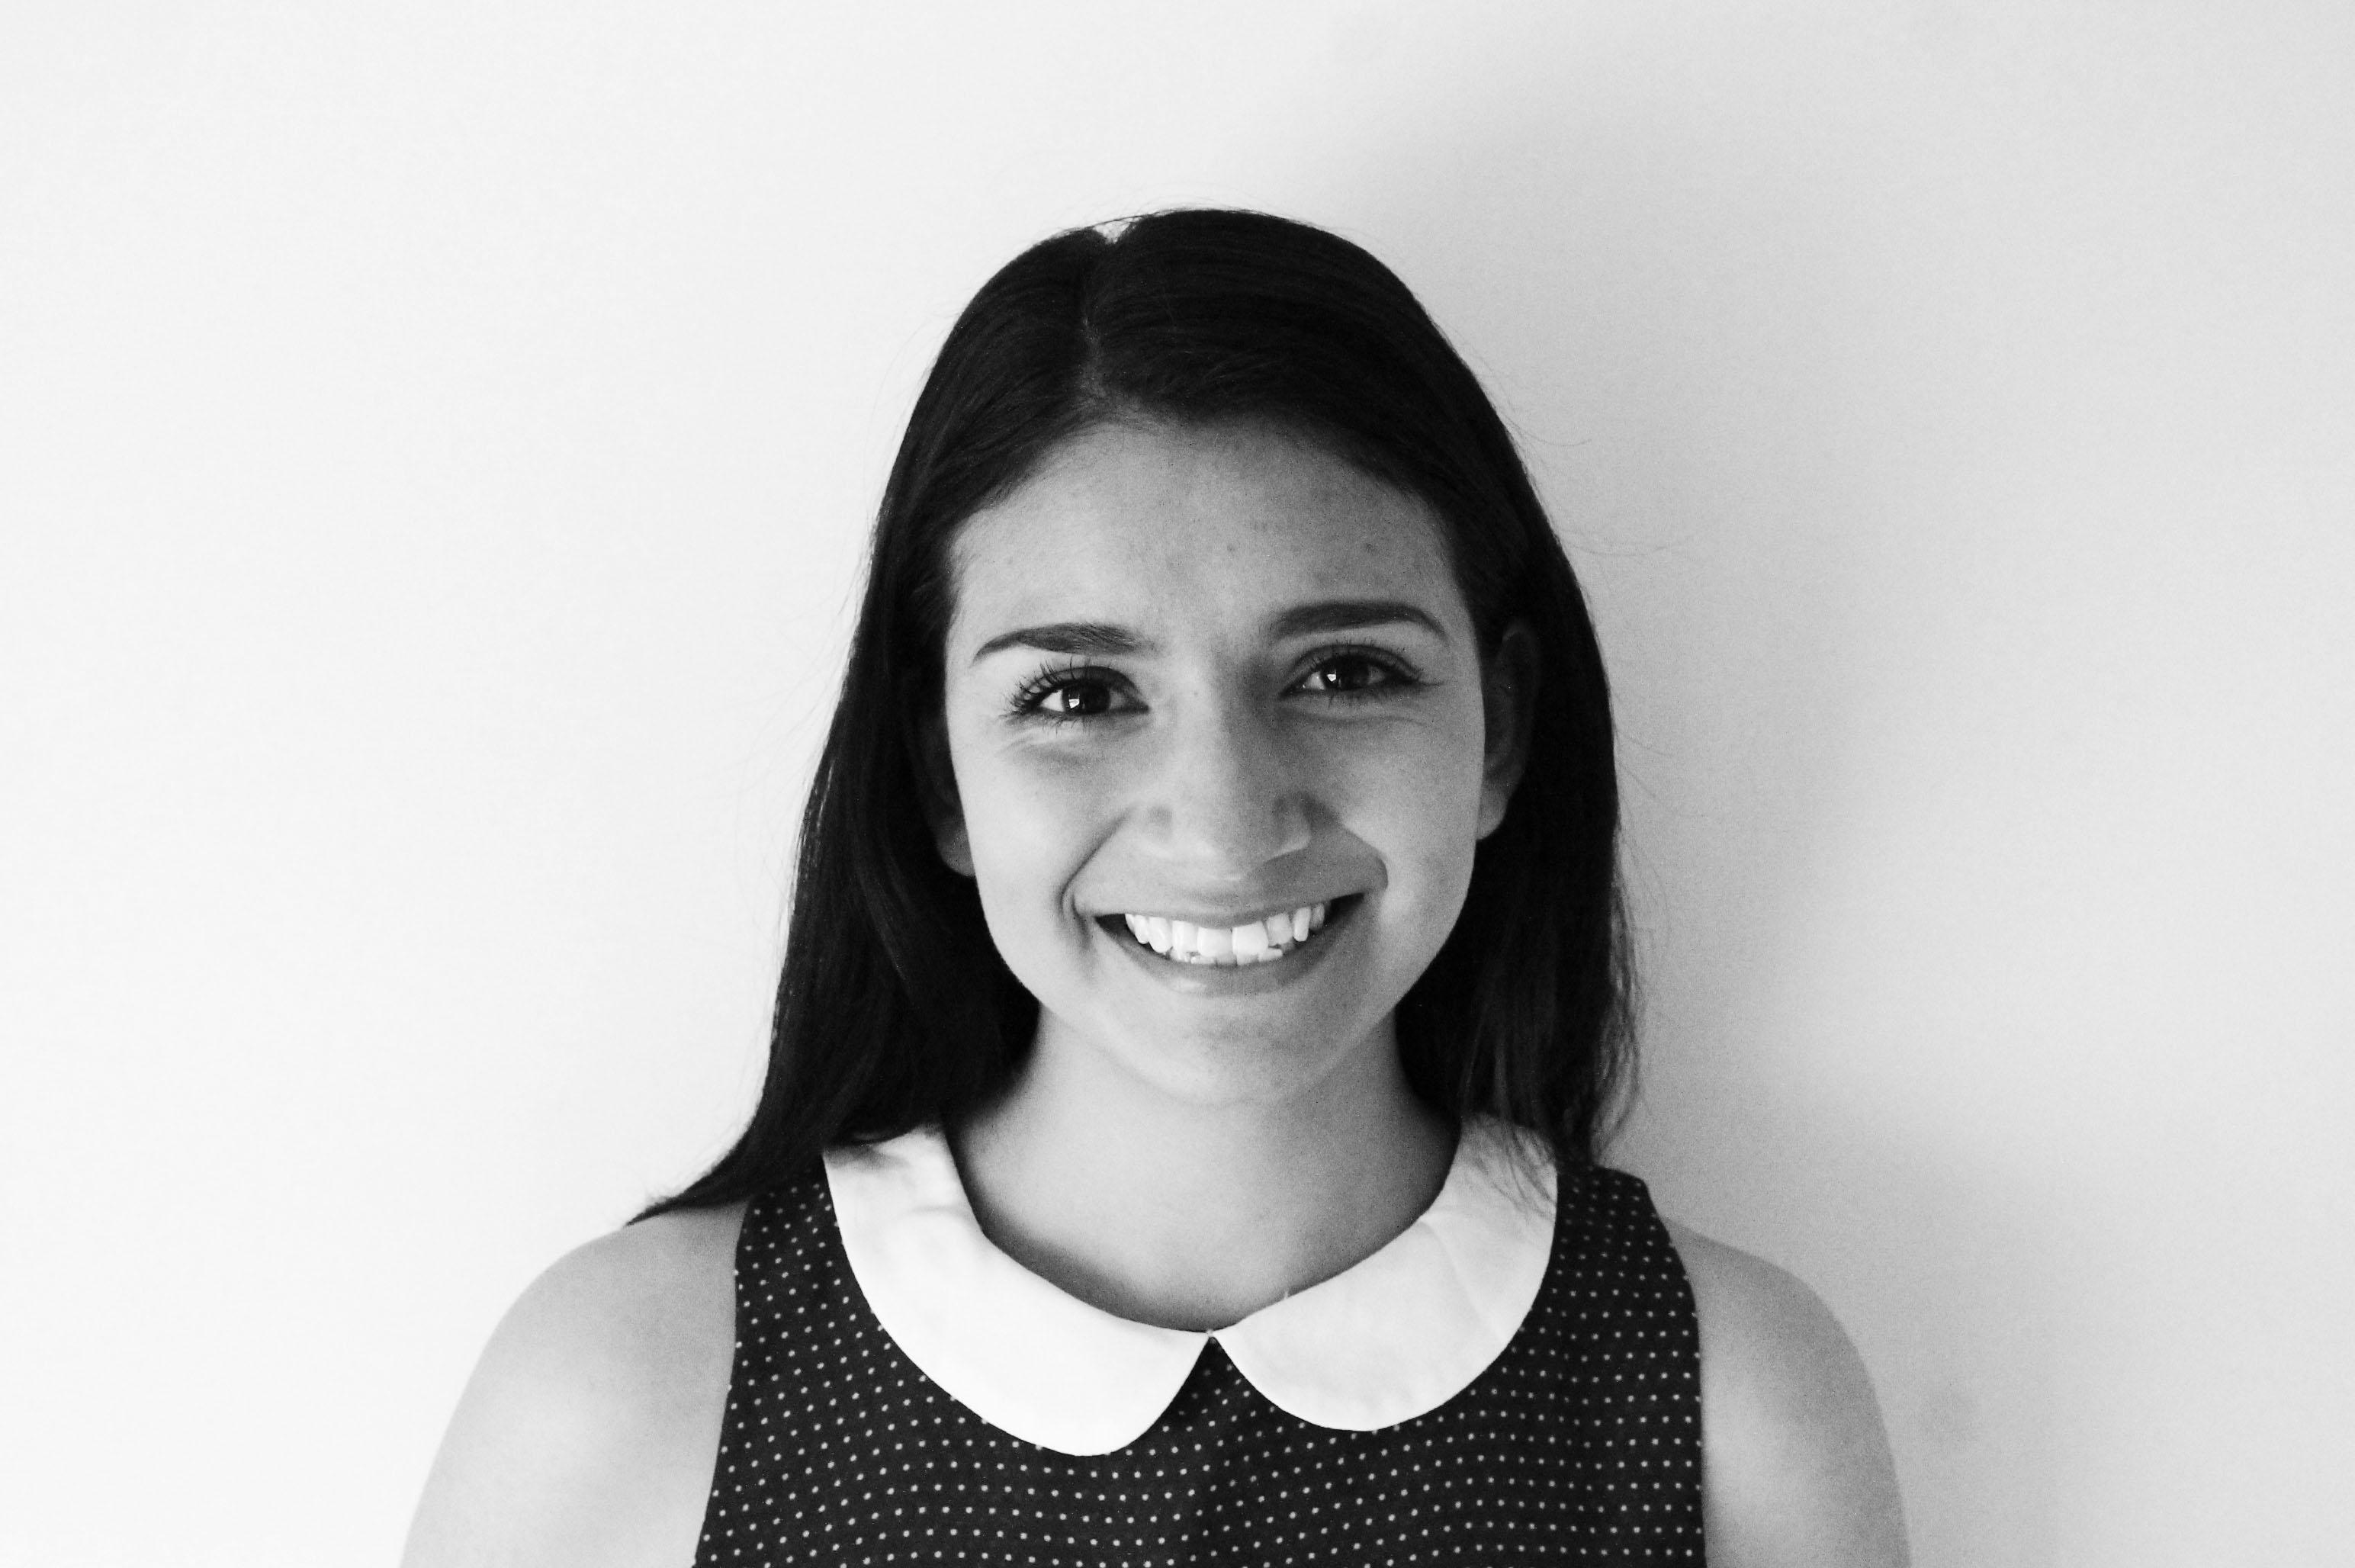 Maria Arias-Gonzalez